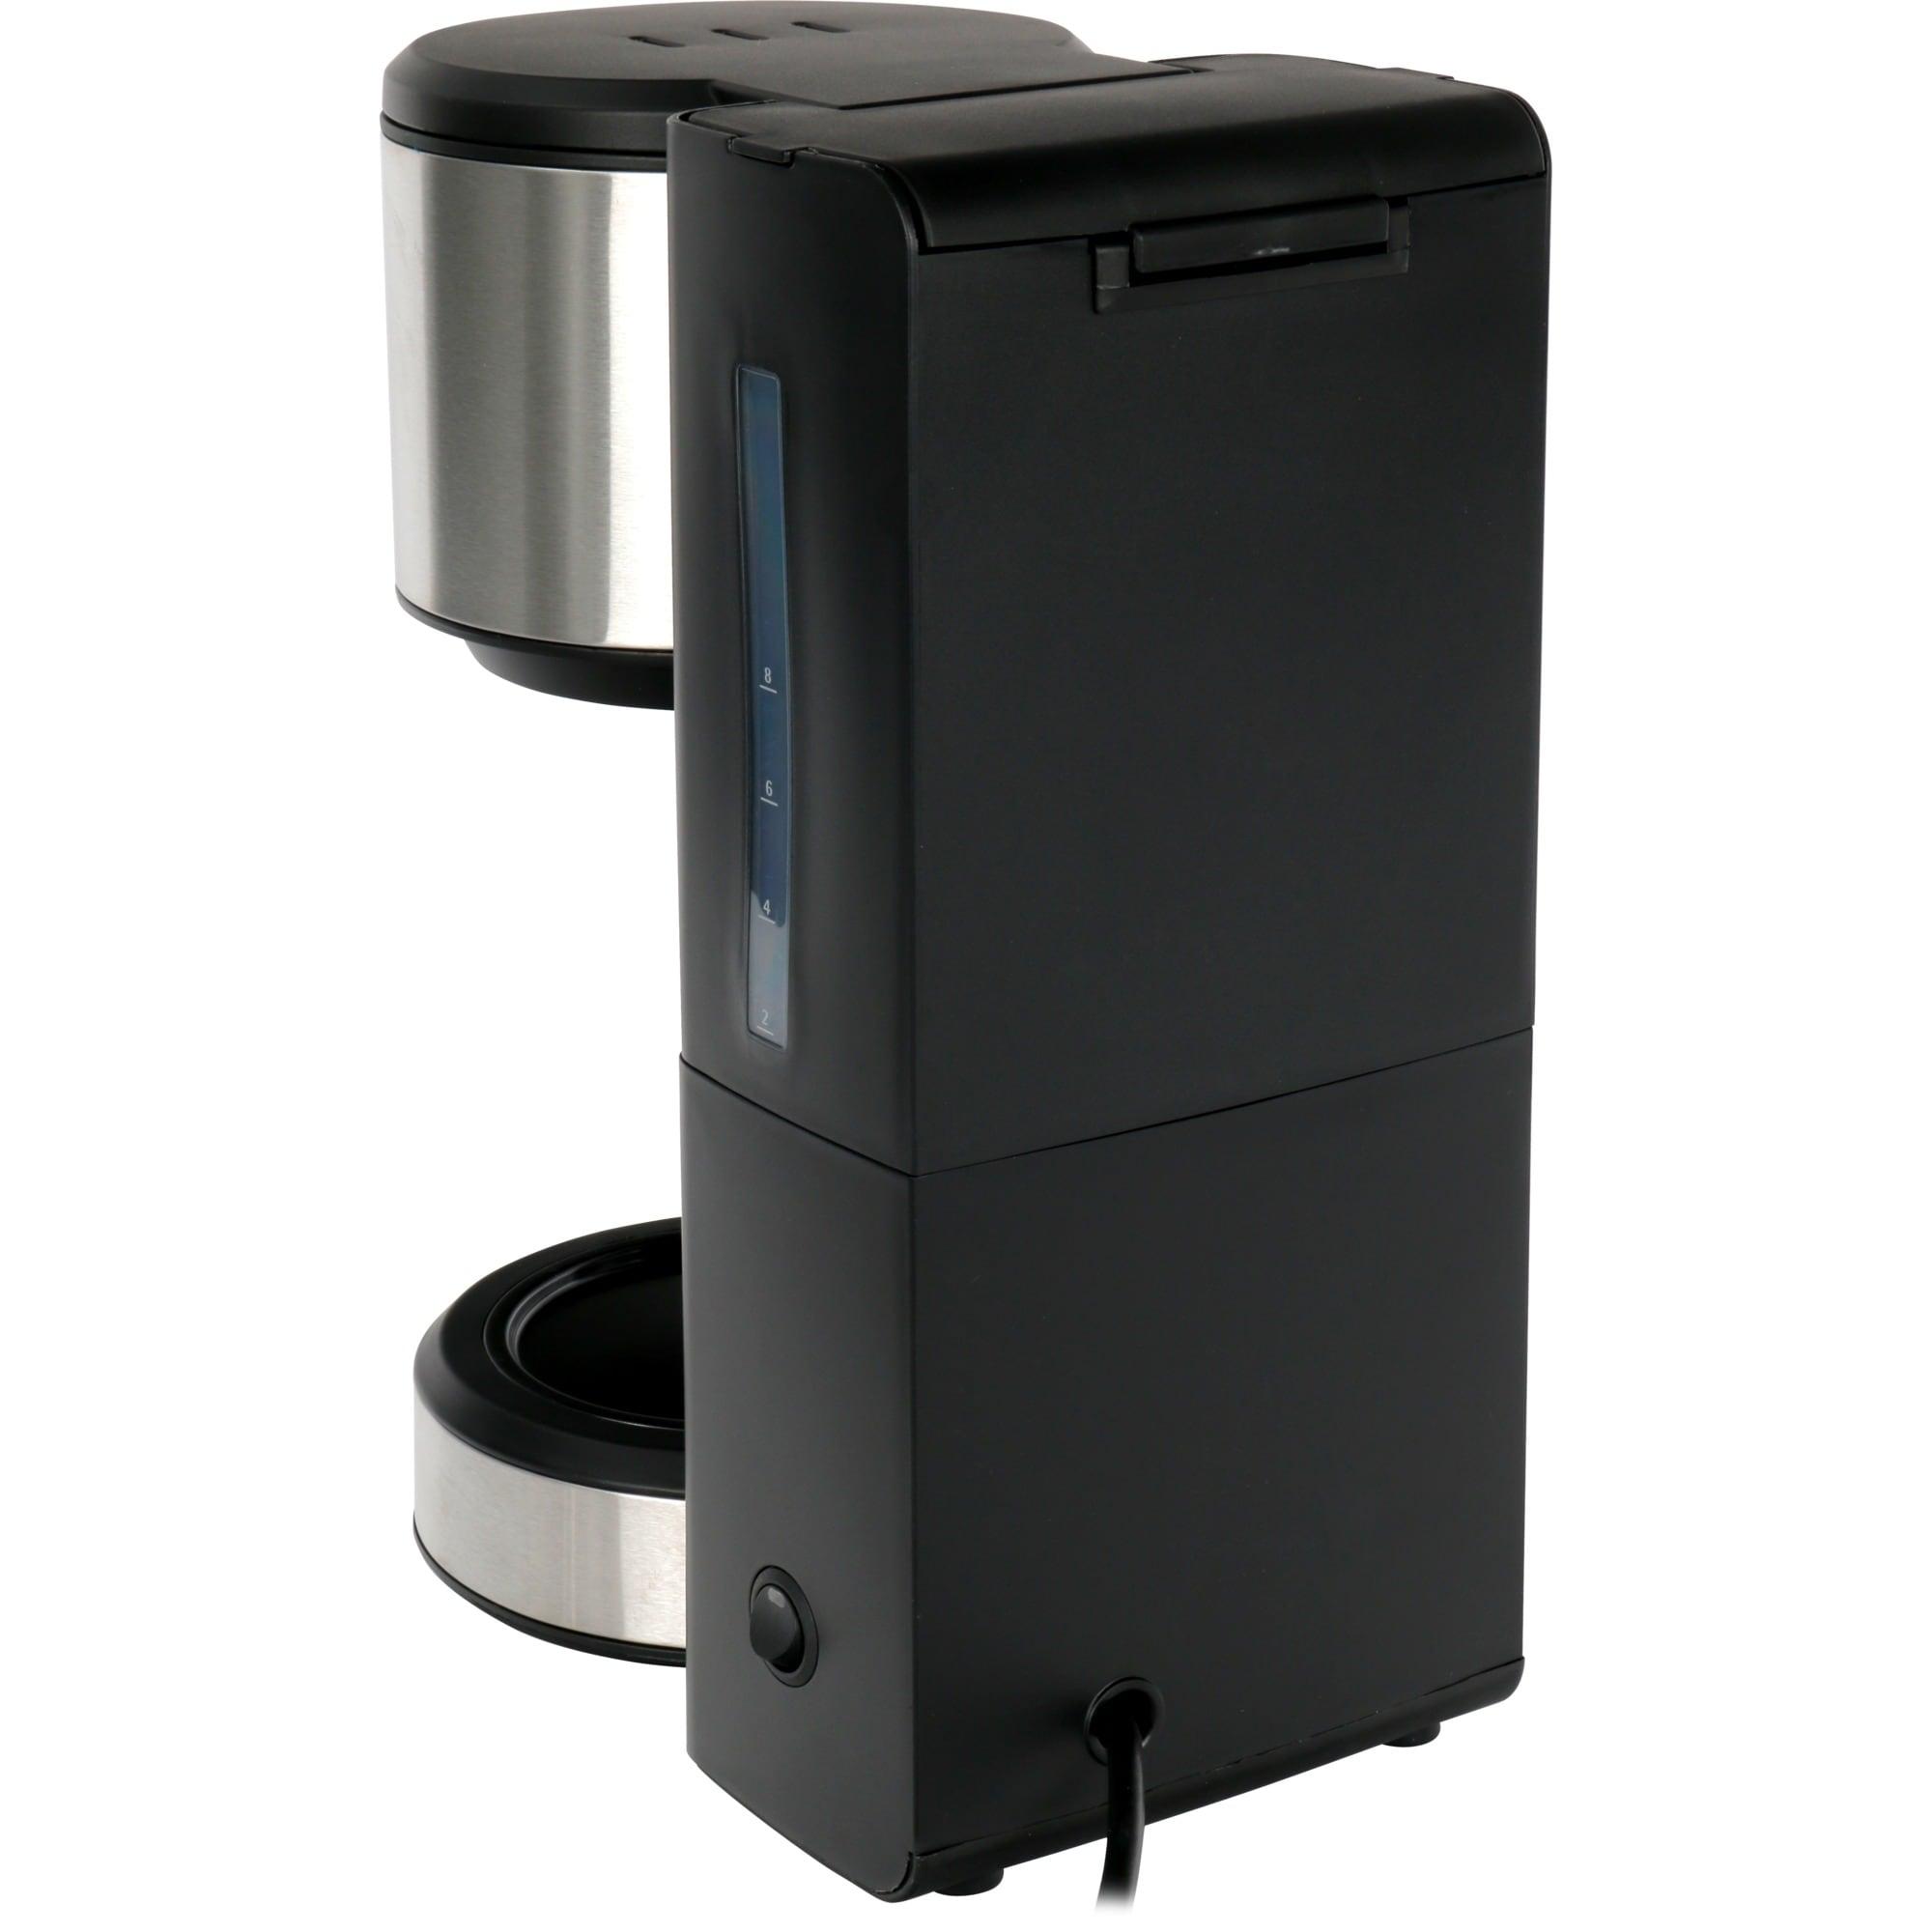 WMF Filtermaschine Kaffeemaschine Stelio Aroma Thermo